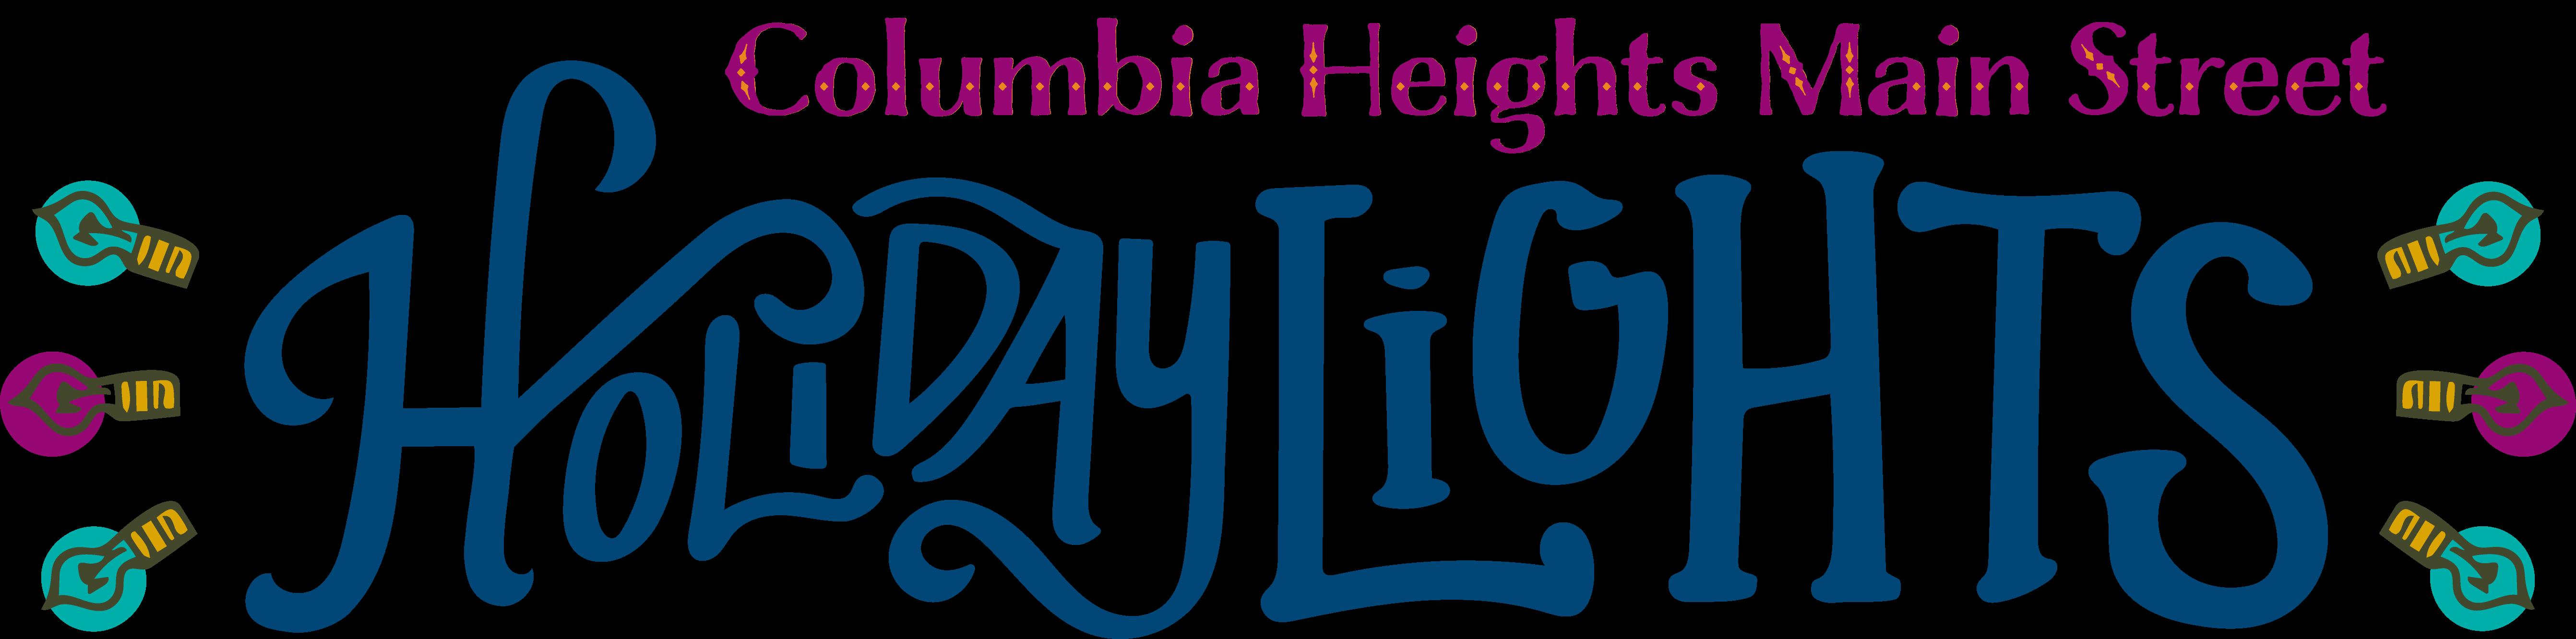 Columbia Heights Main Street Holiday Lights